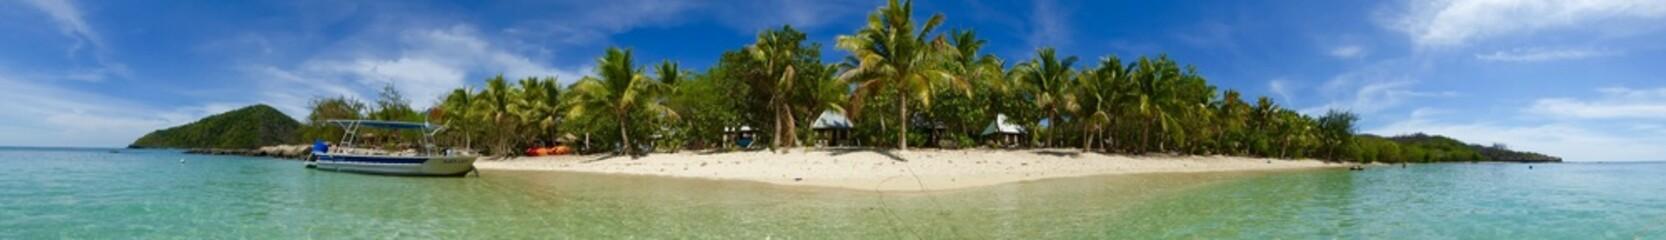 Barefoot Island (Fidschi)